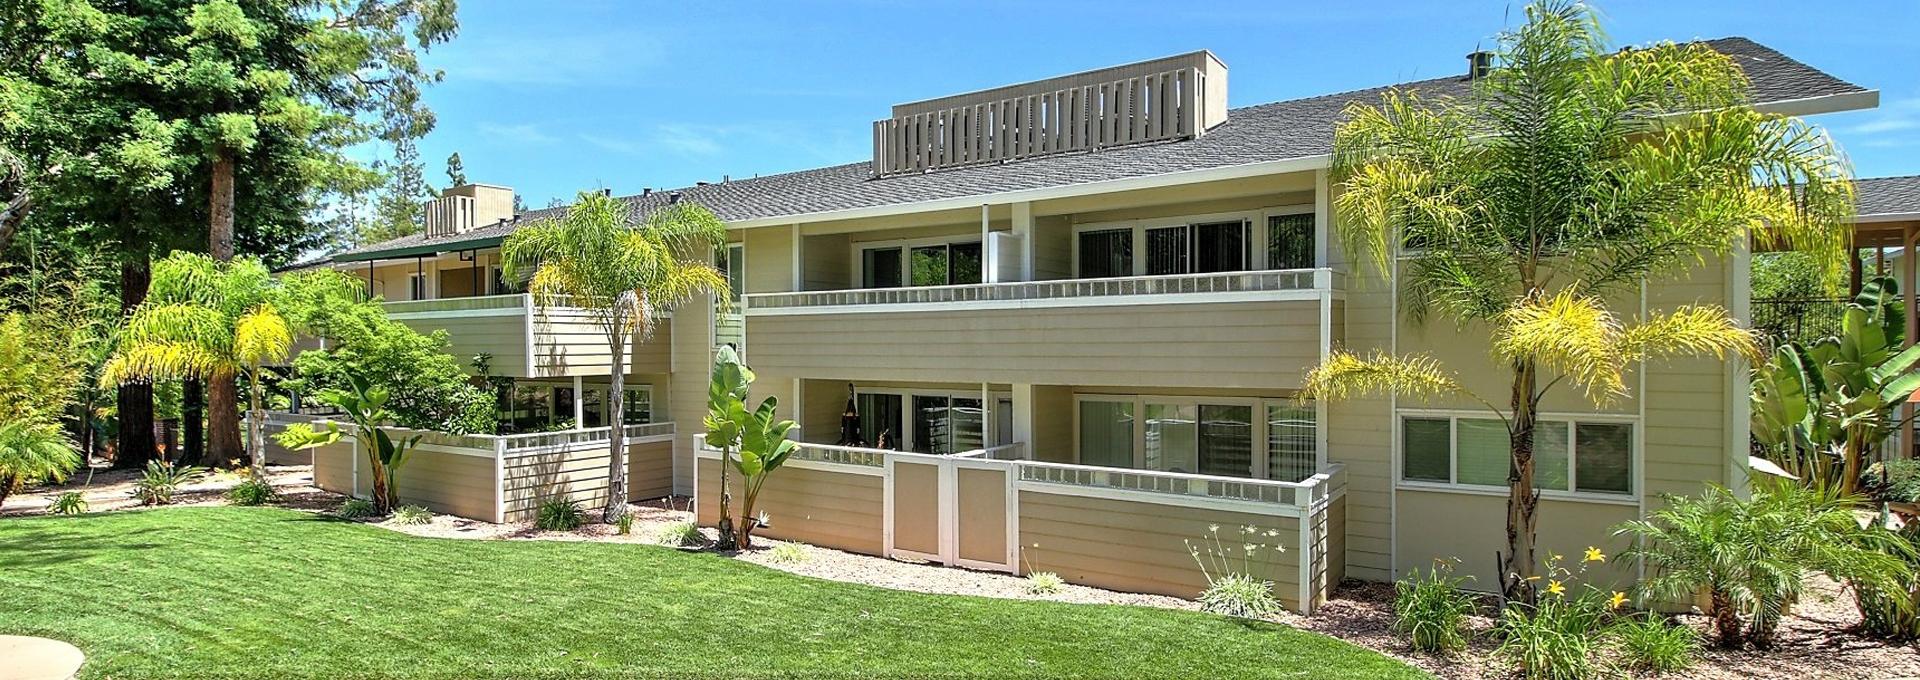 Sharon Grove Apartments